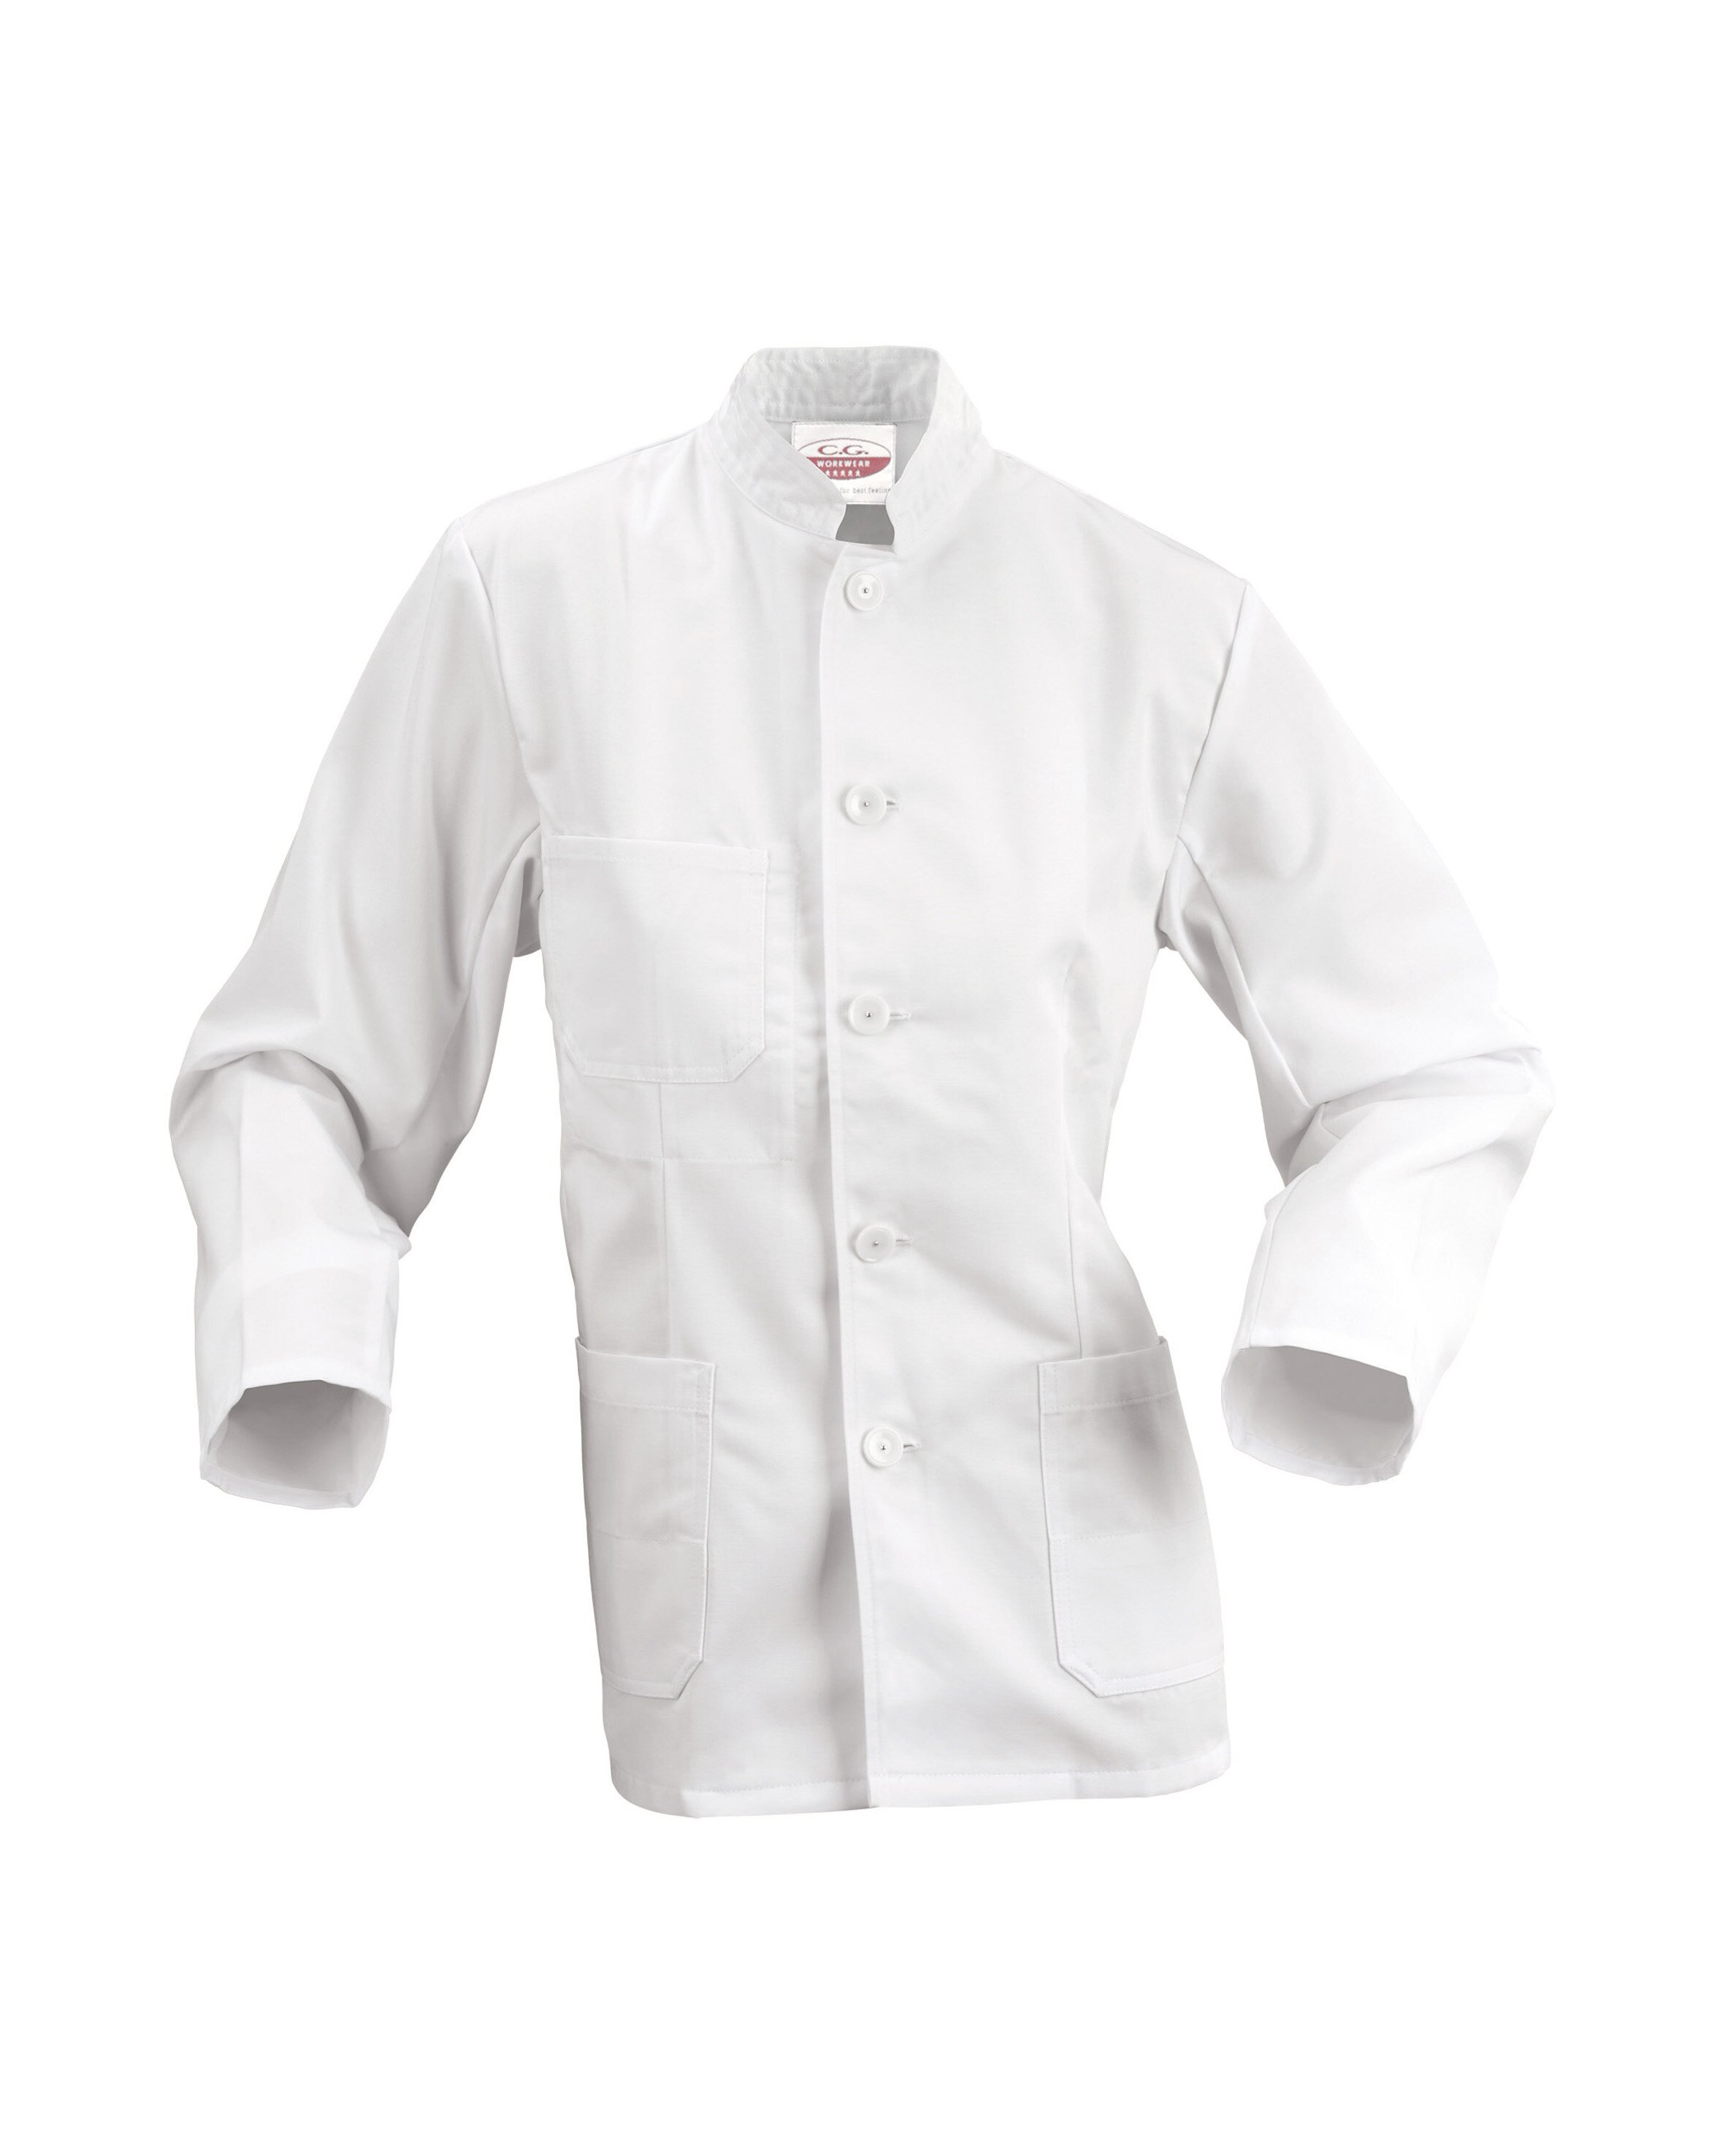 Veste blanche de service